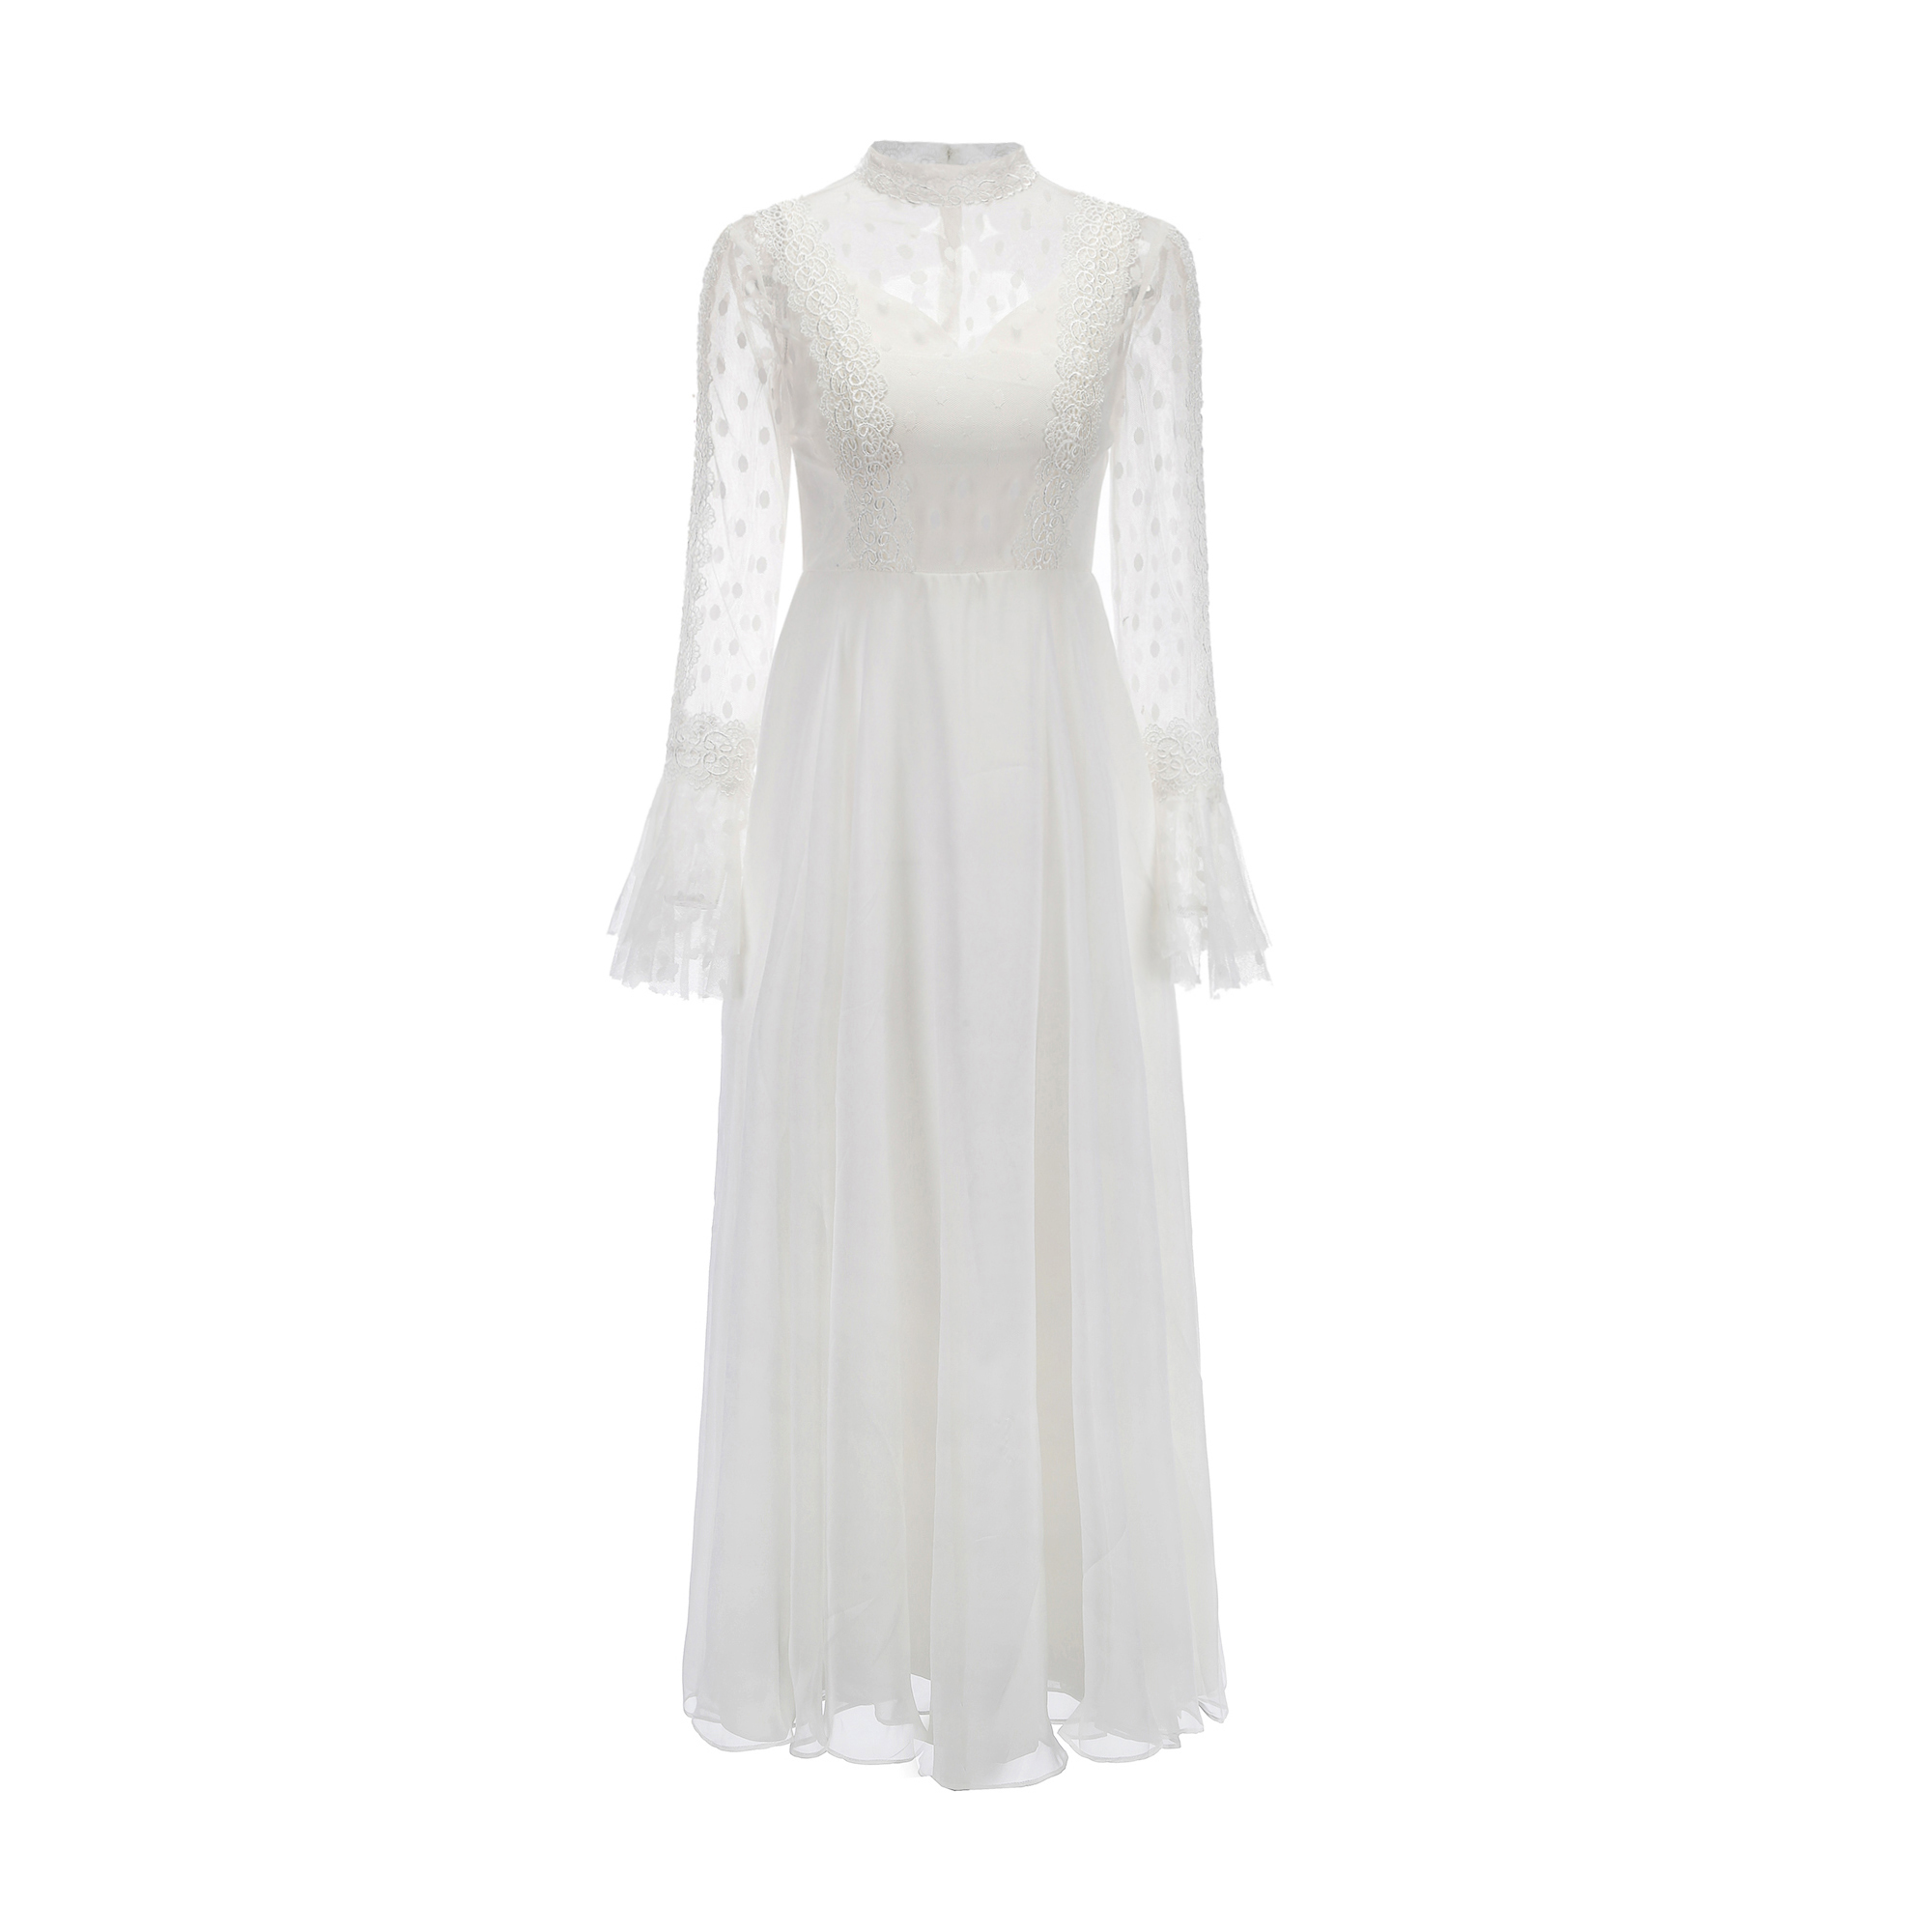 【DearWhite】ウェディングドレス Aライン プリンセス エンパイア デコルテ 結婚式 披露宴 二次会 パーティーウェディングドレス・カラードレス・サイズオーダー格安オーダーメイド DW00020